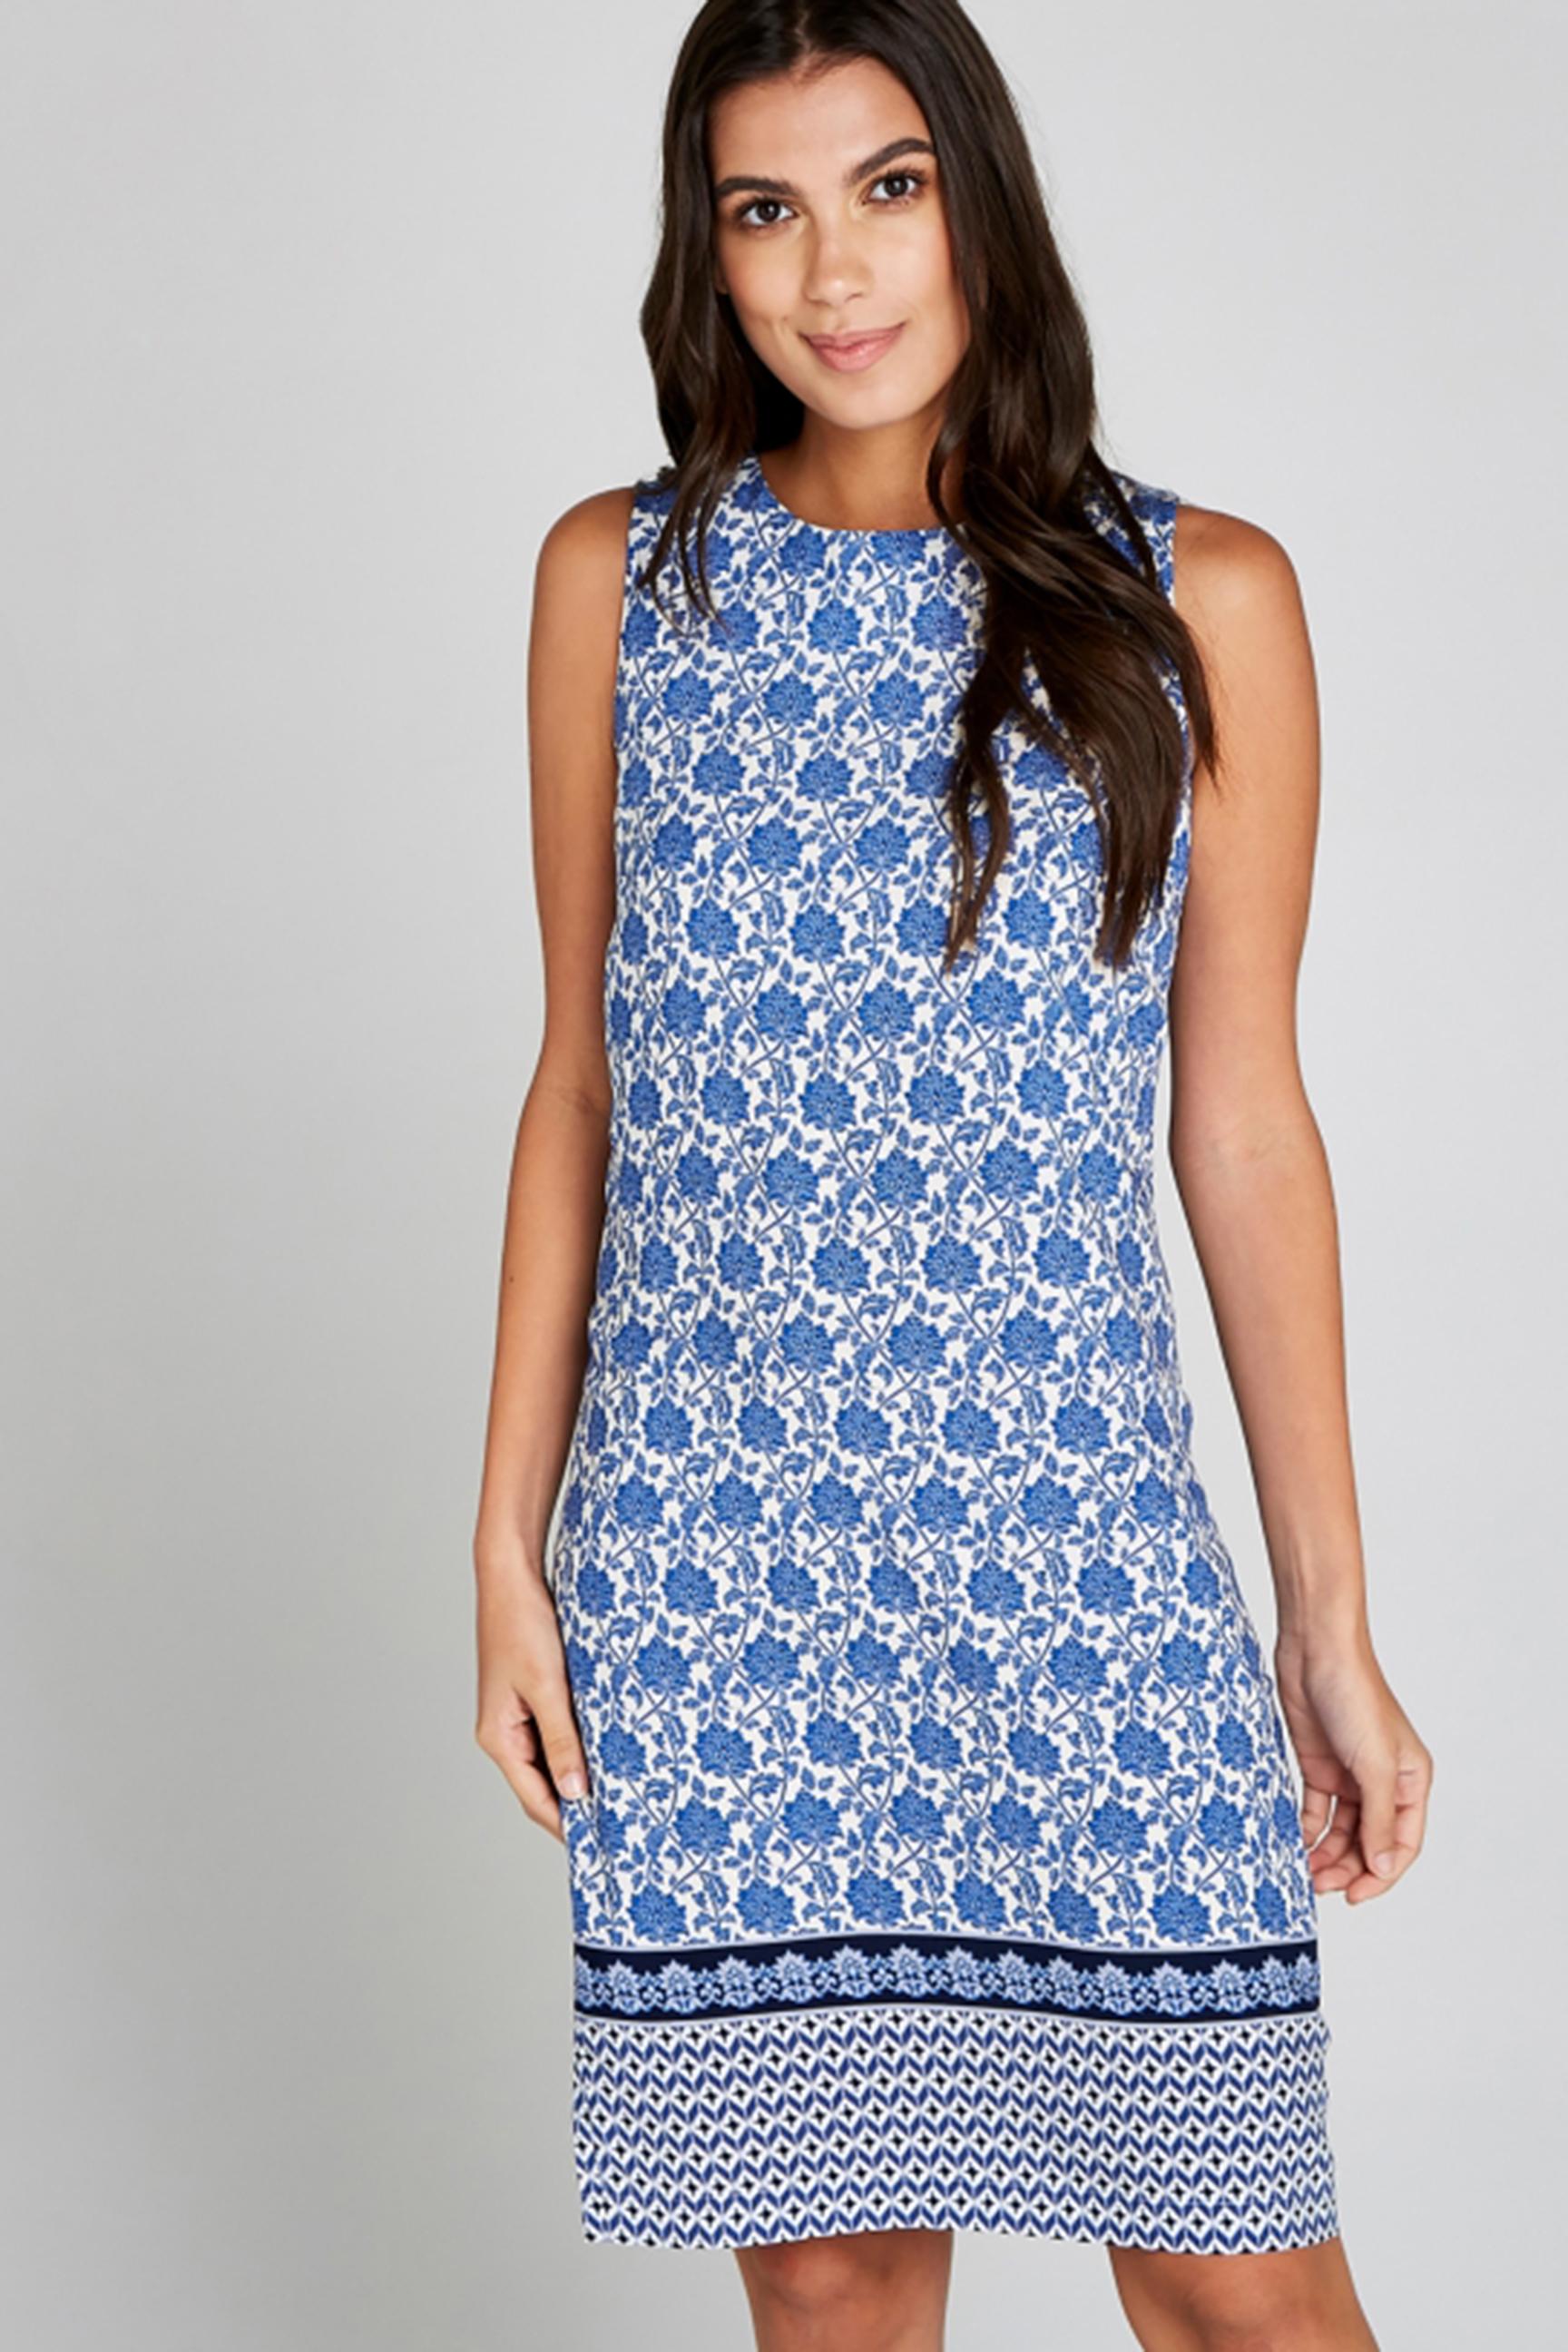 Apricot Damen Kleid Blue Filigree Wallpaper Border Dress Tayler Fashion